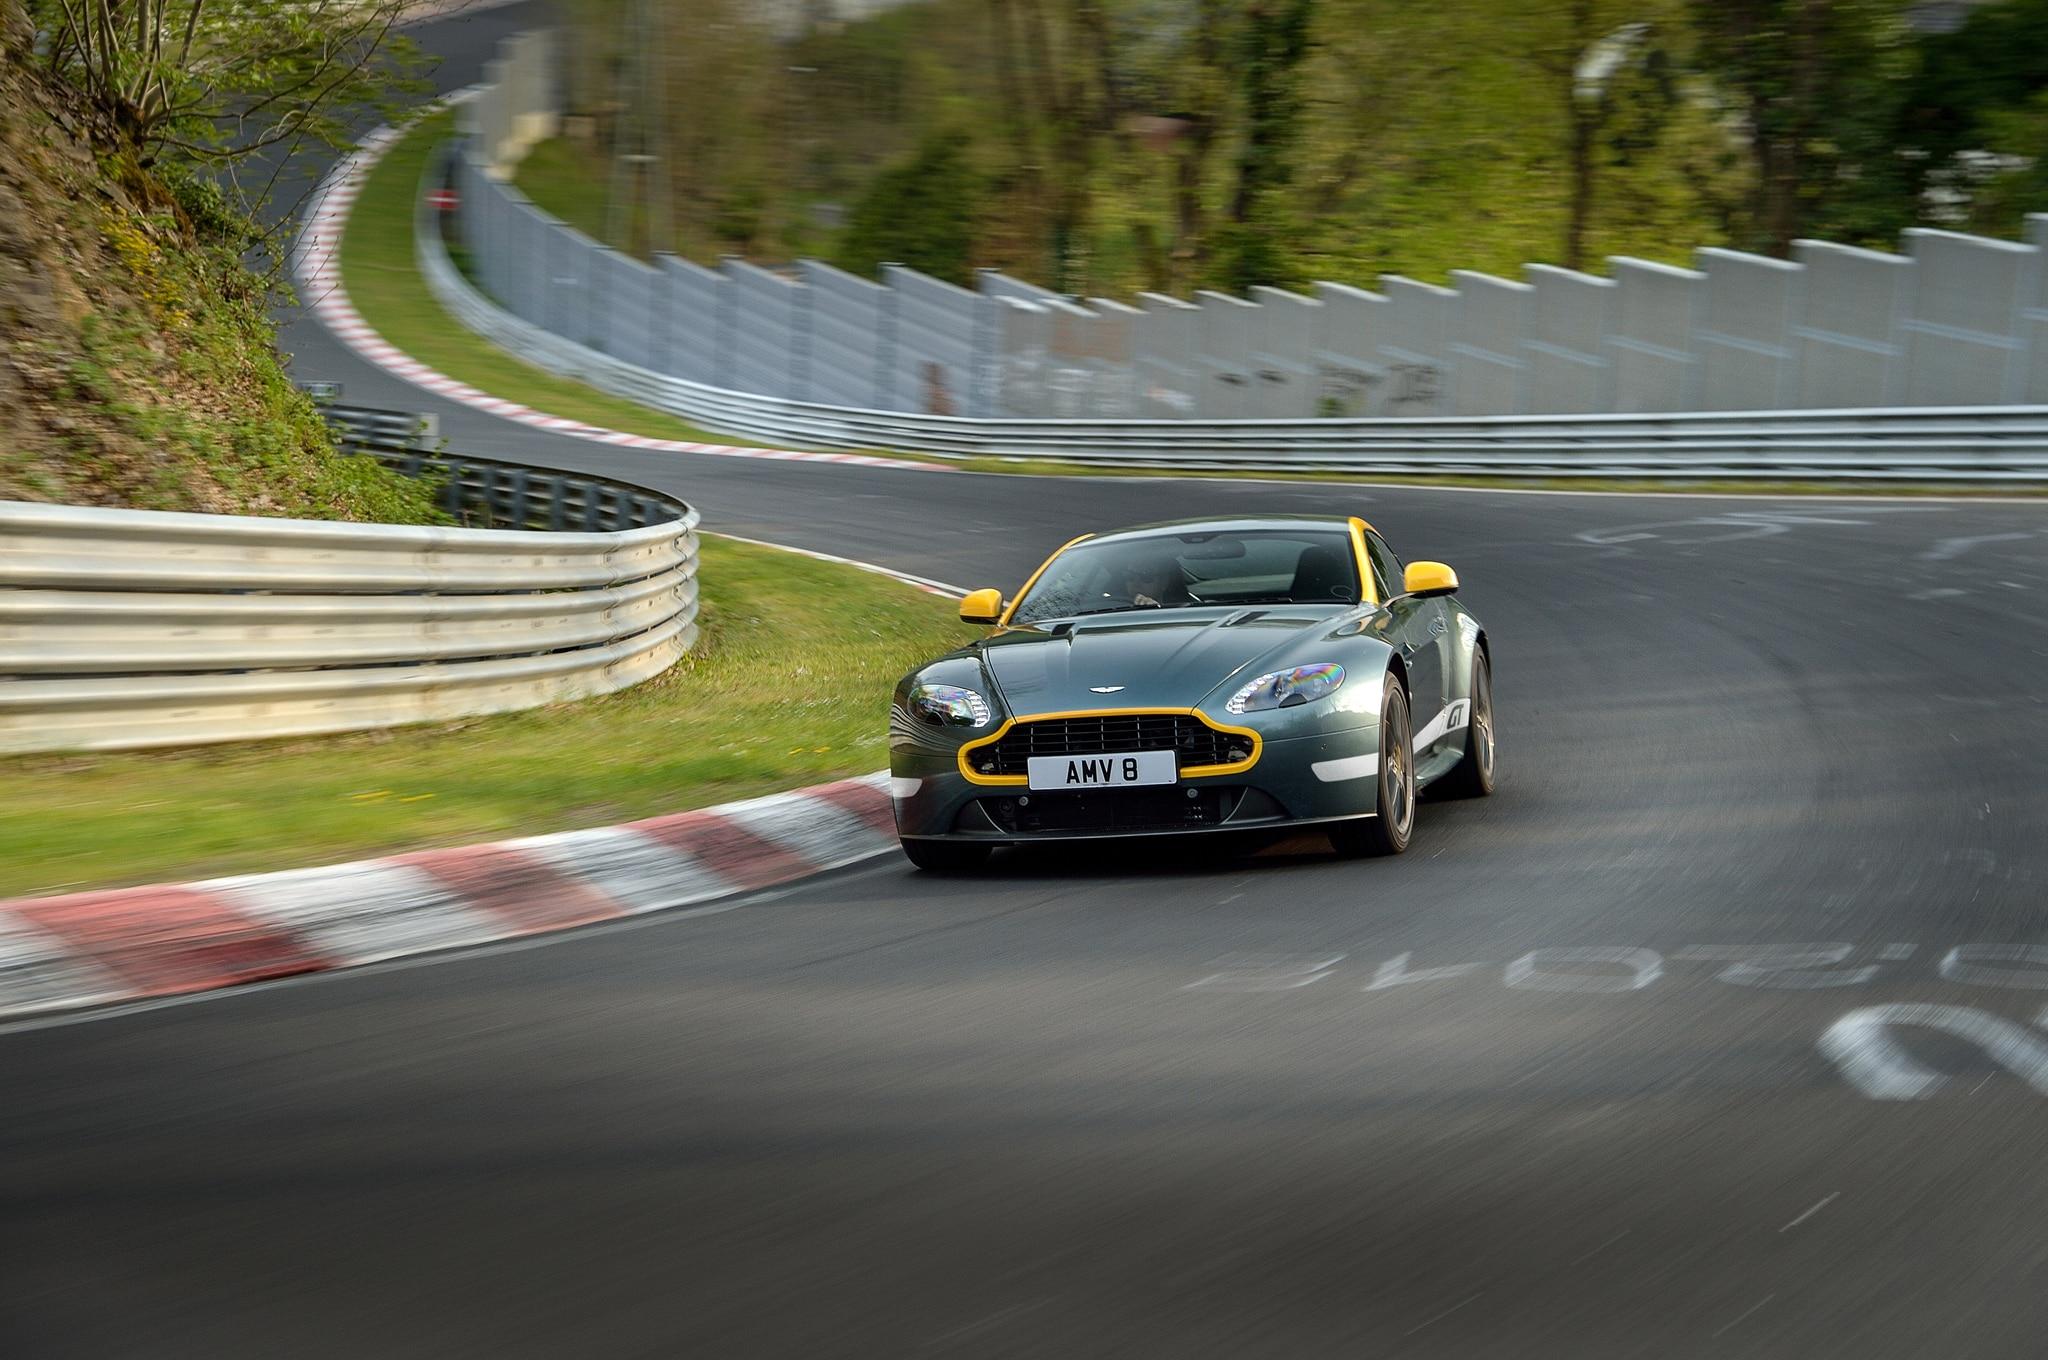 Aston Martin V Vantage GT Review Automobile Magazine - Fast car 361